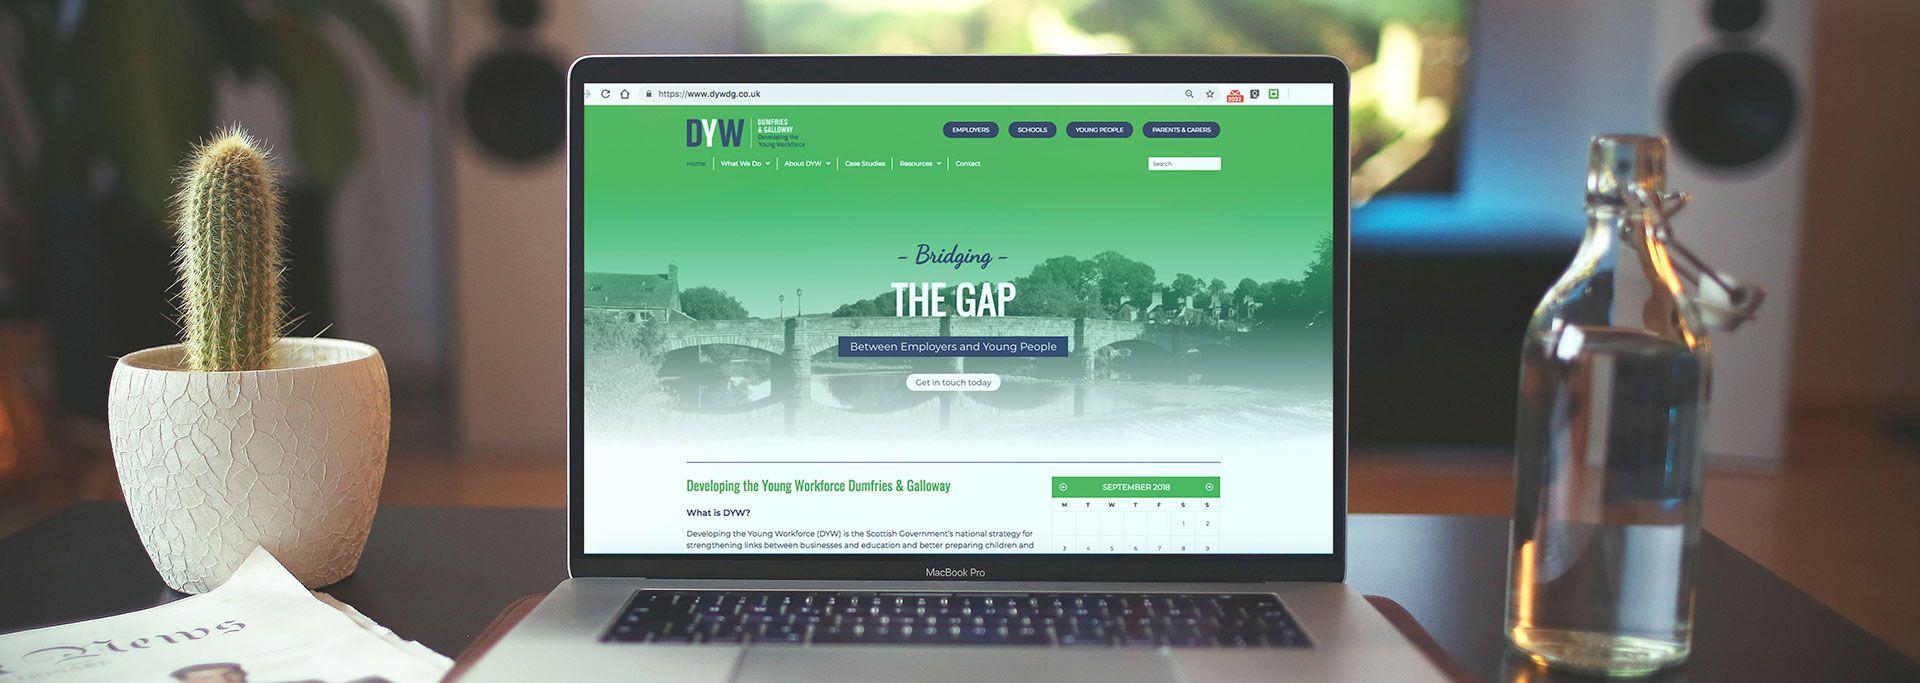 DYW Website Design